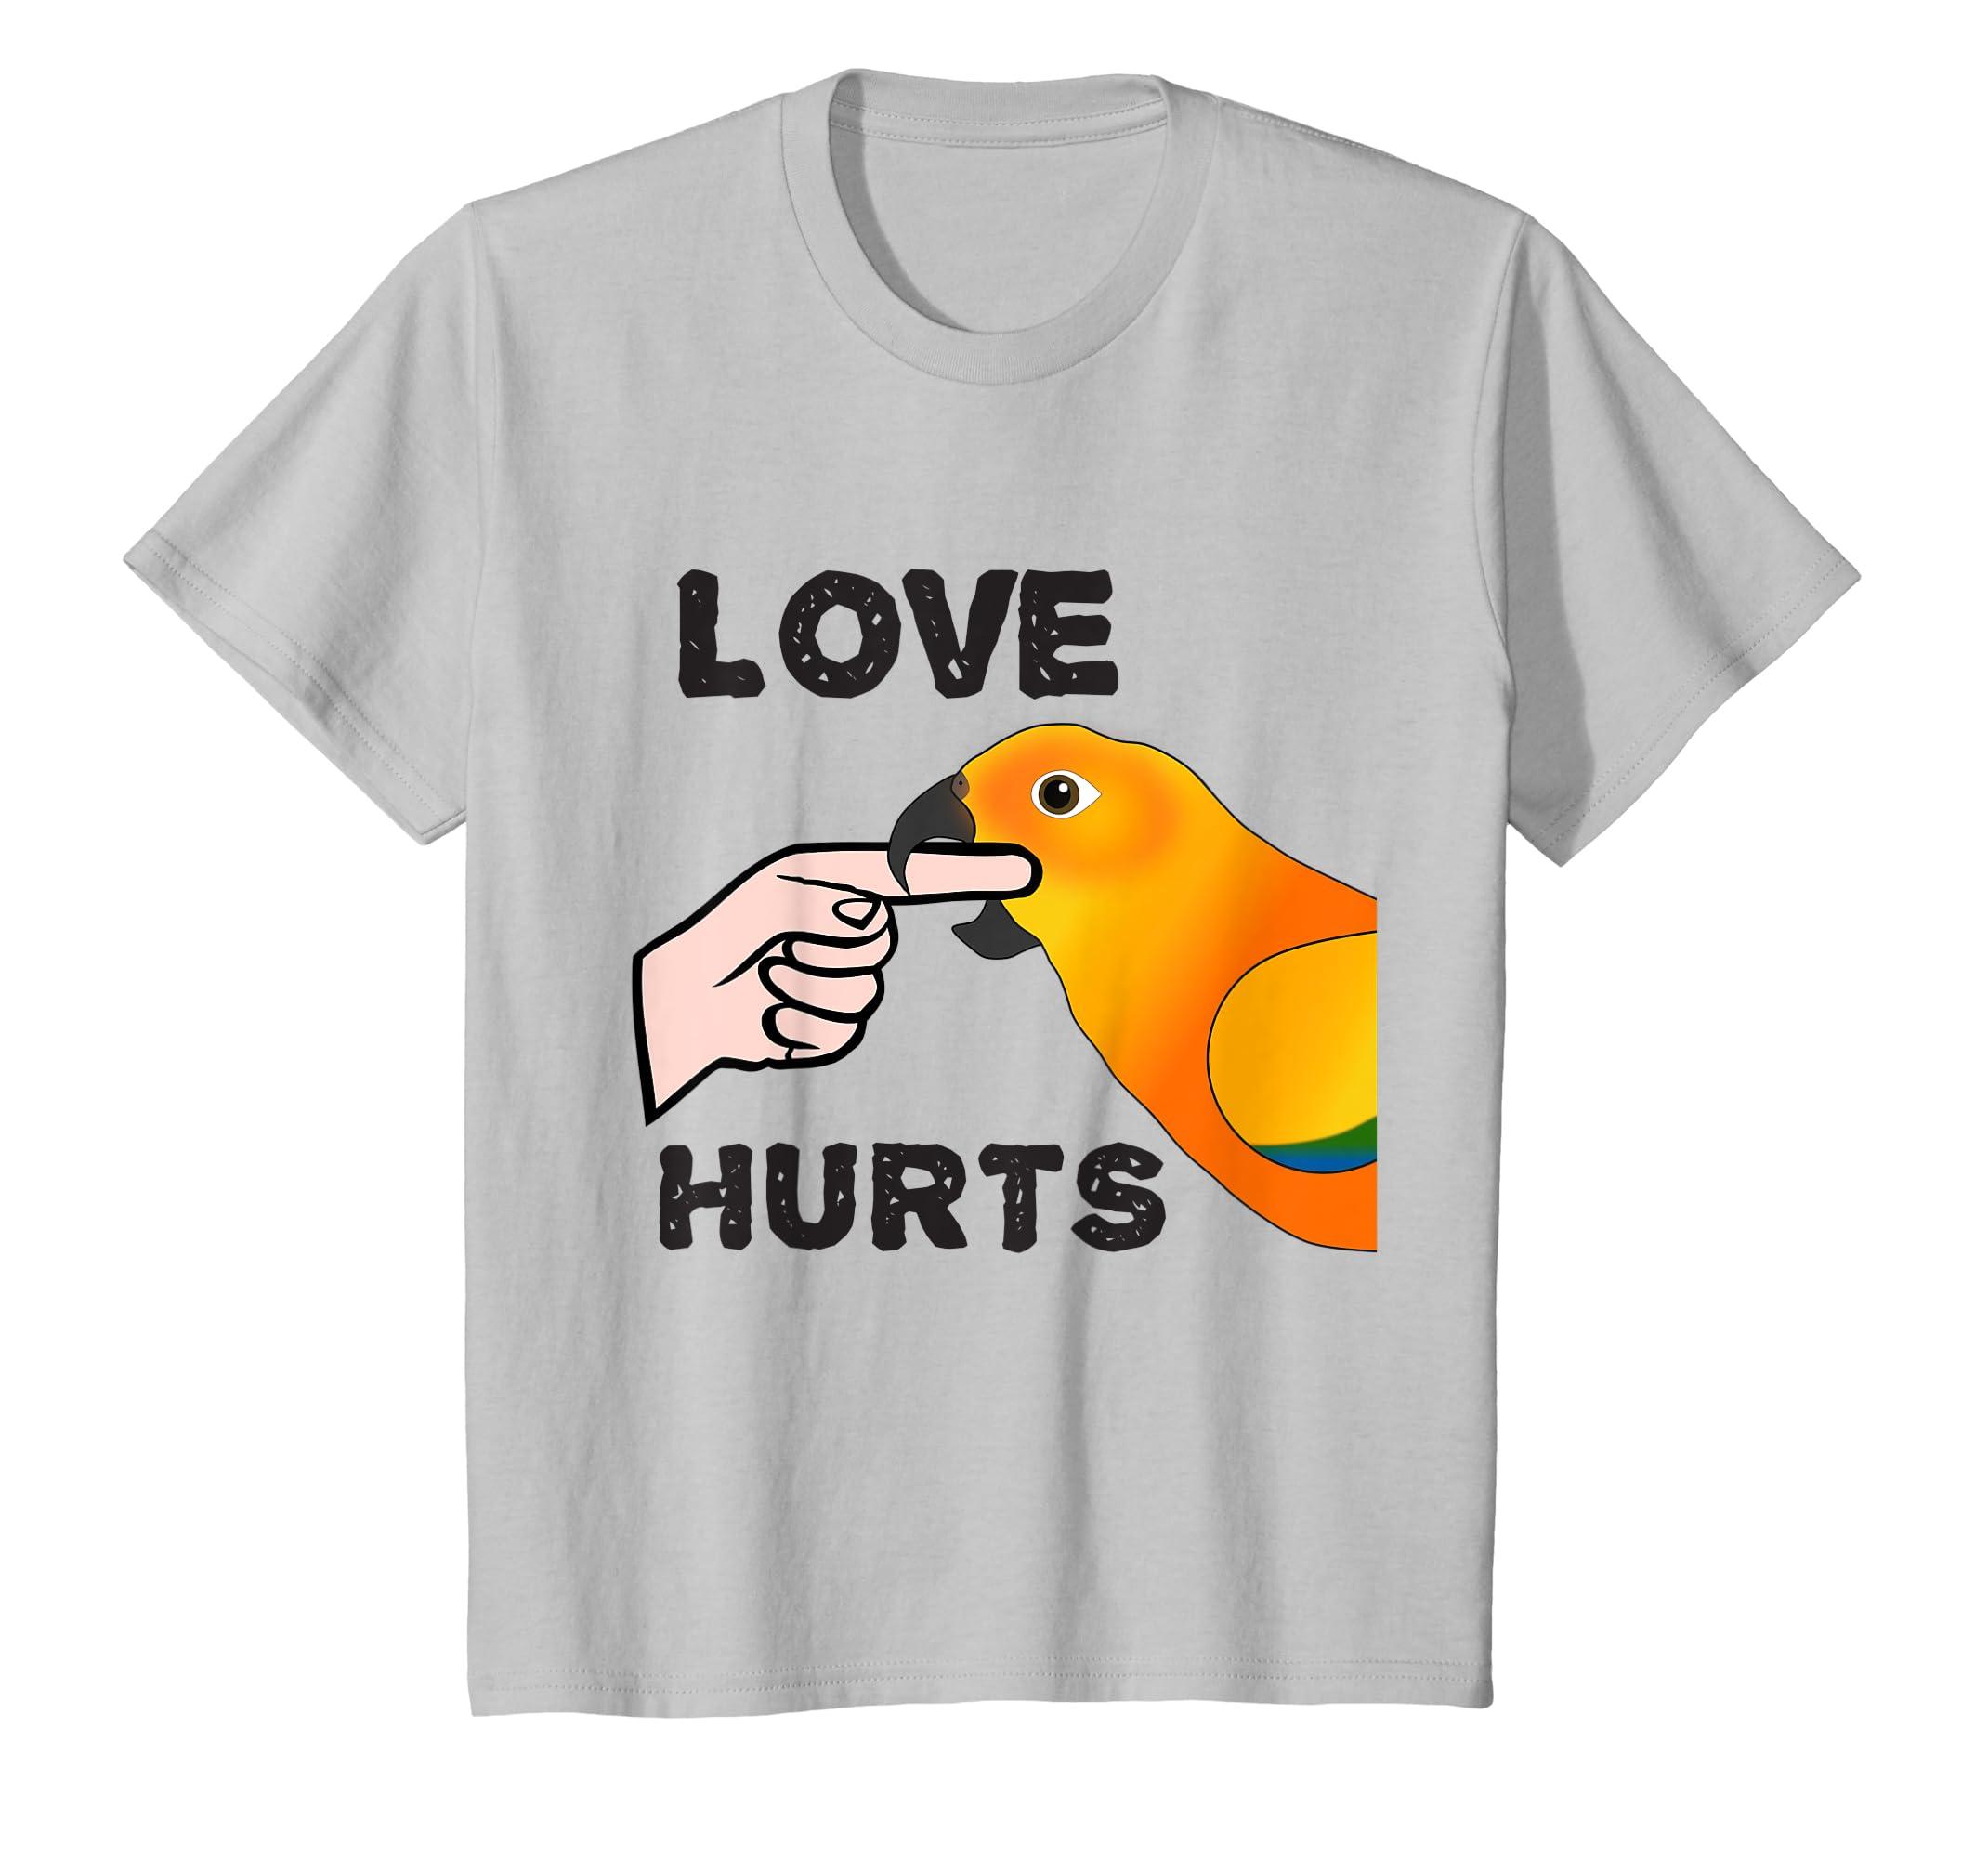 8636818f8485 Amazon.com  Love Hurts Sun Conure Parrot Biting T-shirt Valentine s Day   Clothing